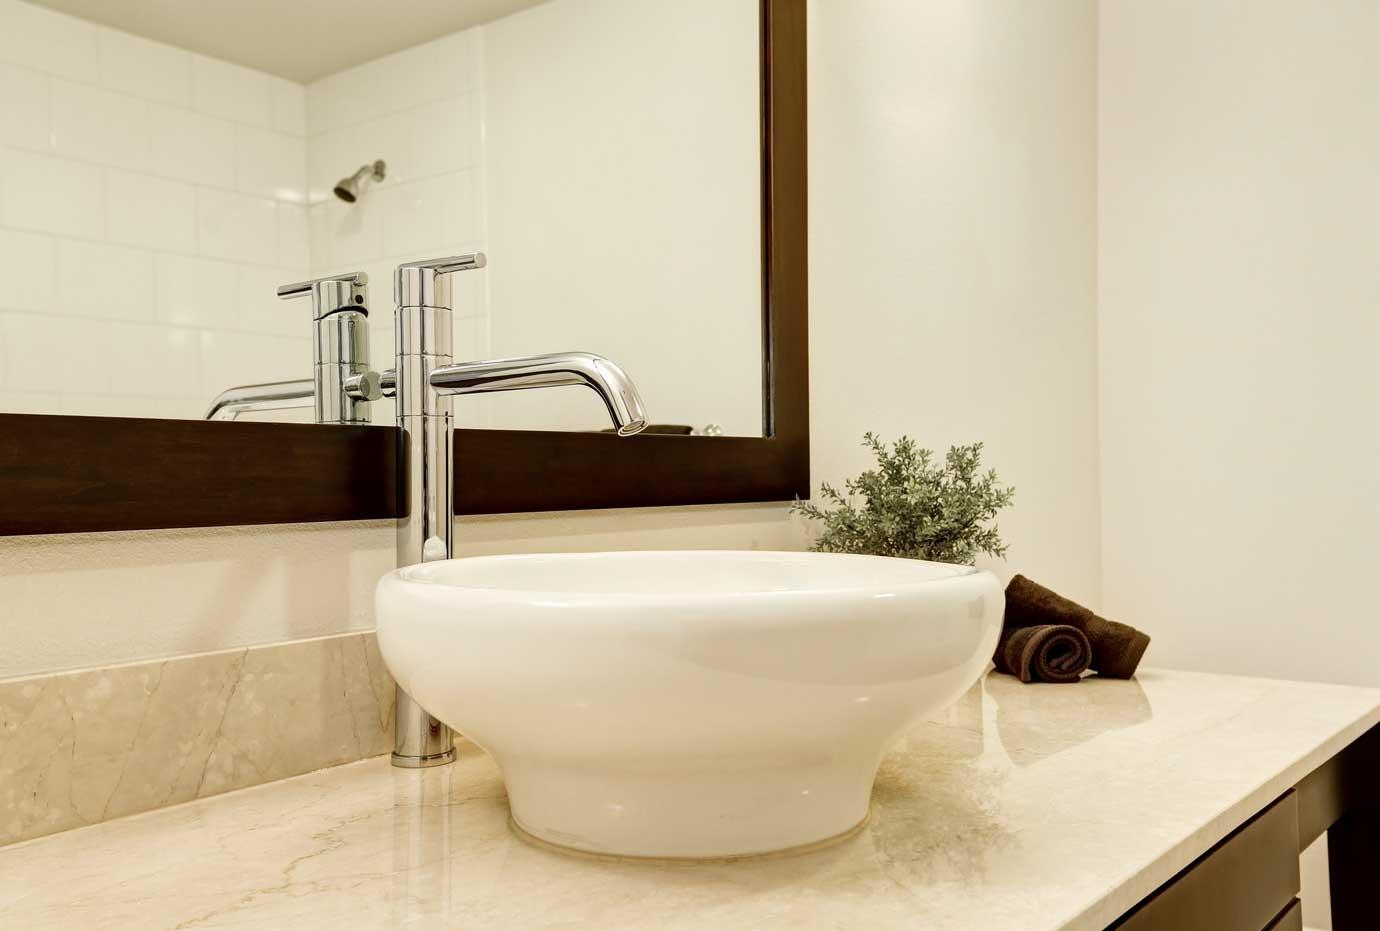 Choosing Sinks for Your Bathroom